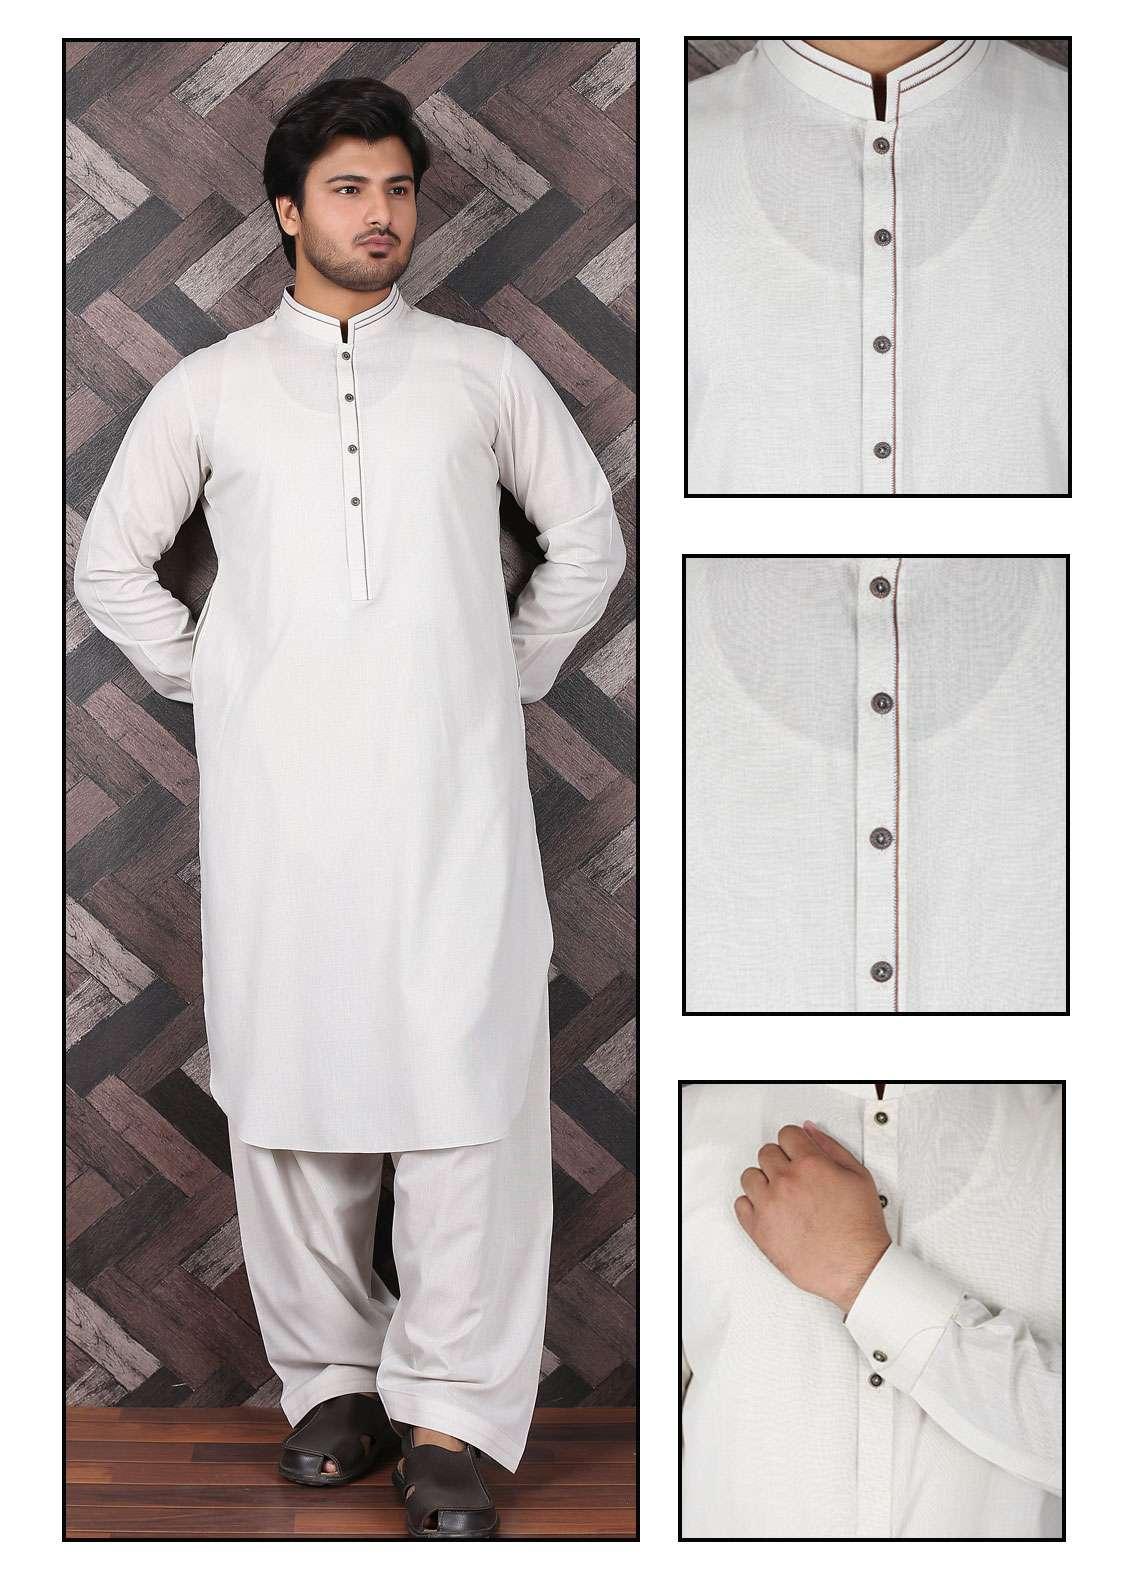 99f8788ff3 Buy Aizaz Zafar Wash N Wear Formal Shalwar Kameez for Men - 685 ...